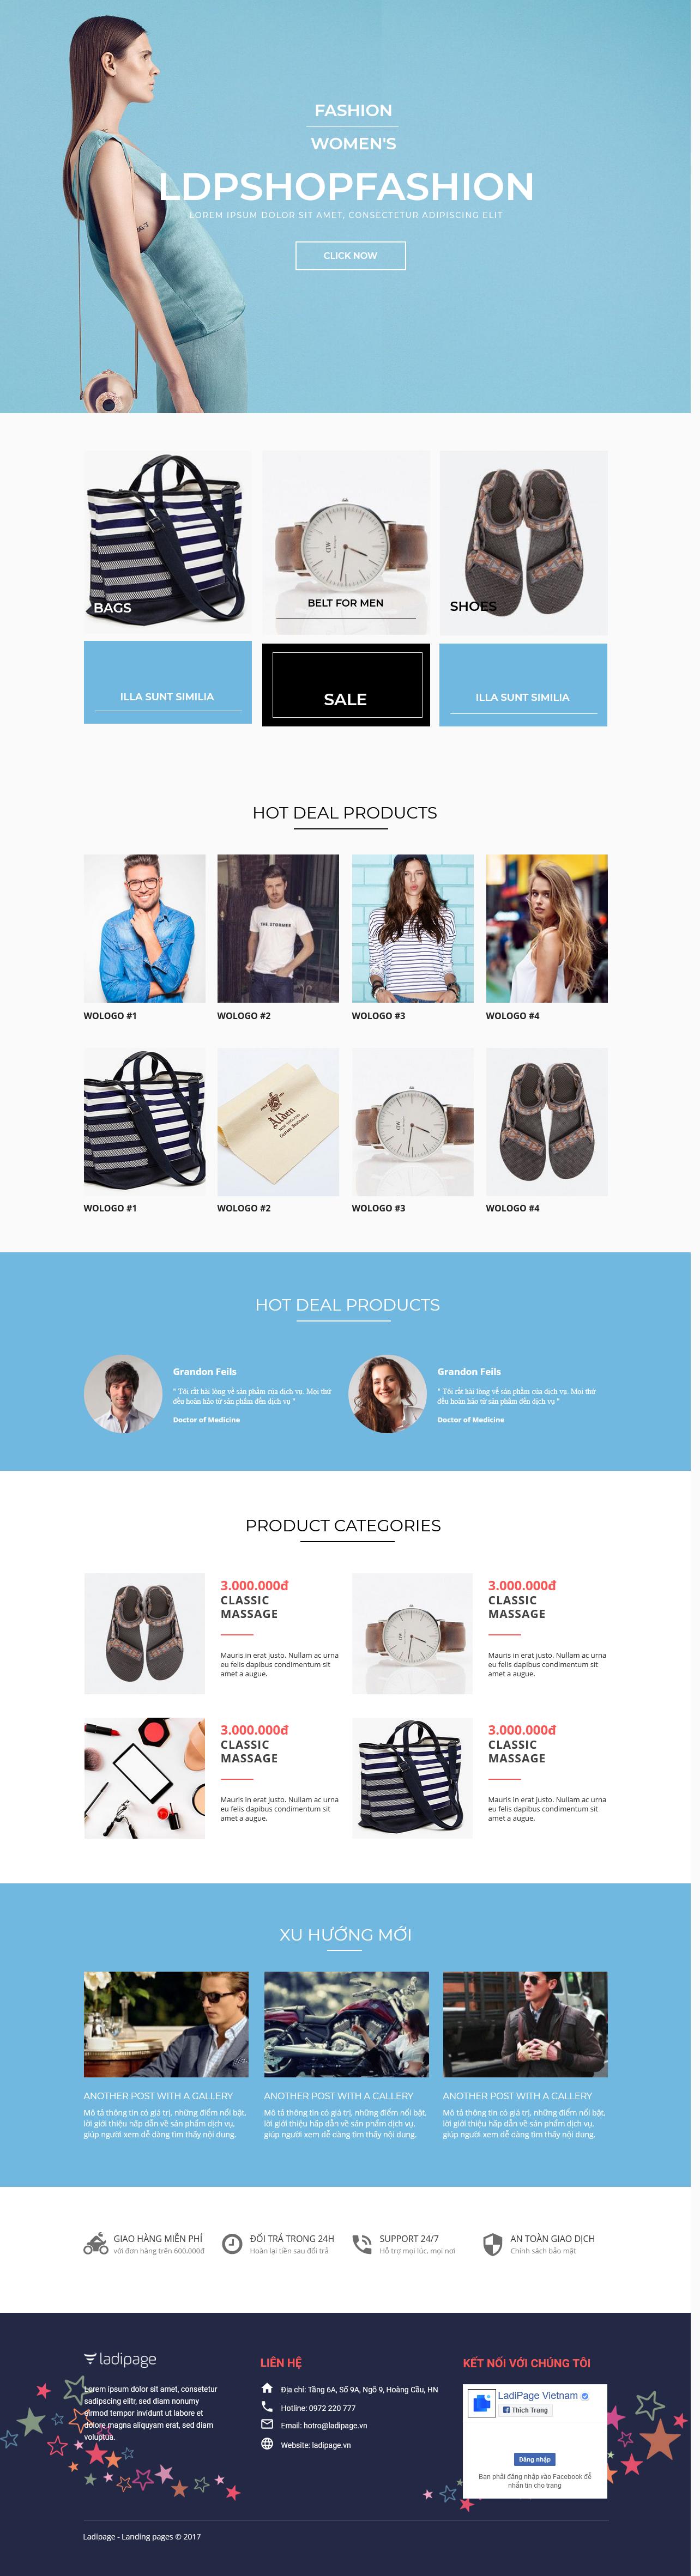 Thiết kế website Thiết kế webiste landingpage thoi-trang---phu-kien Thời trang phụ kiện 09